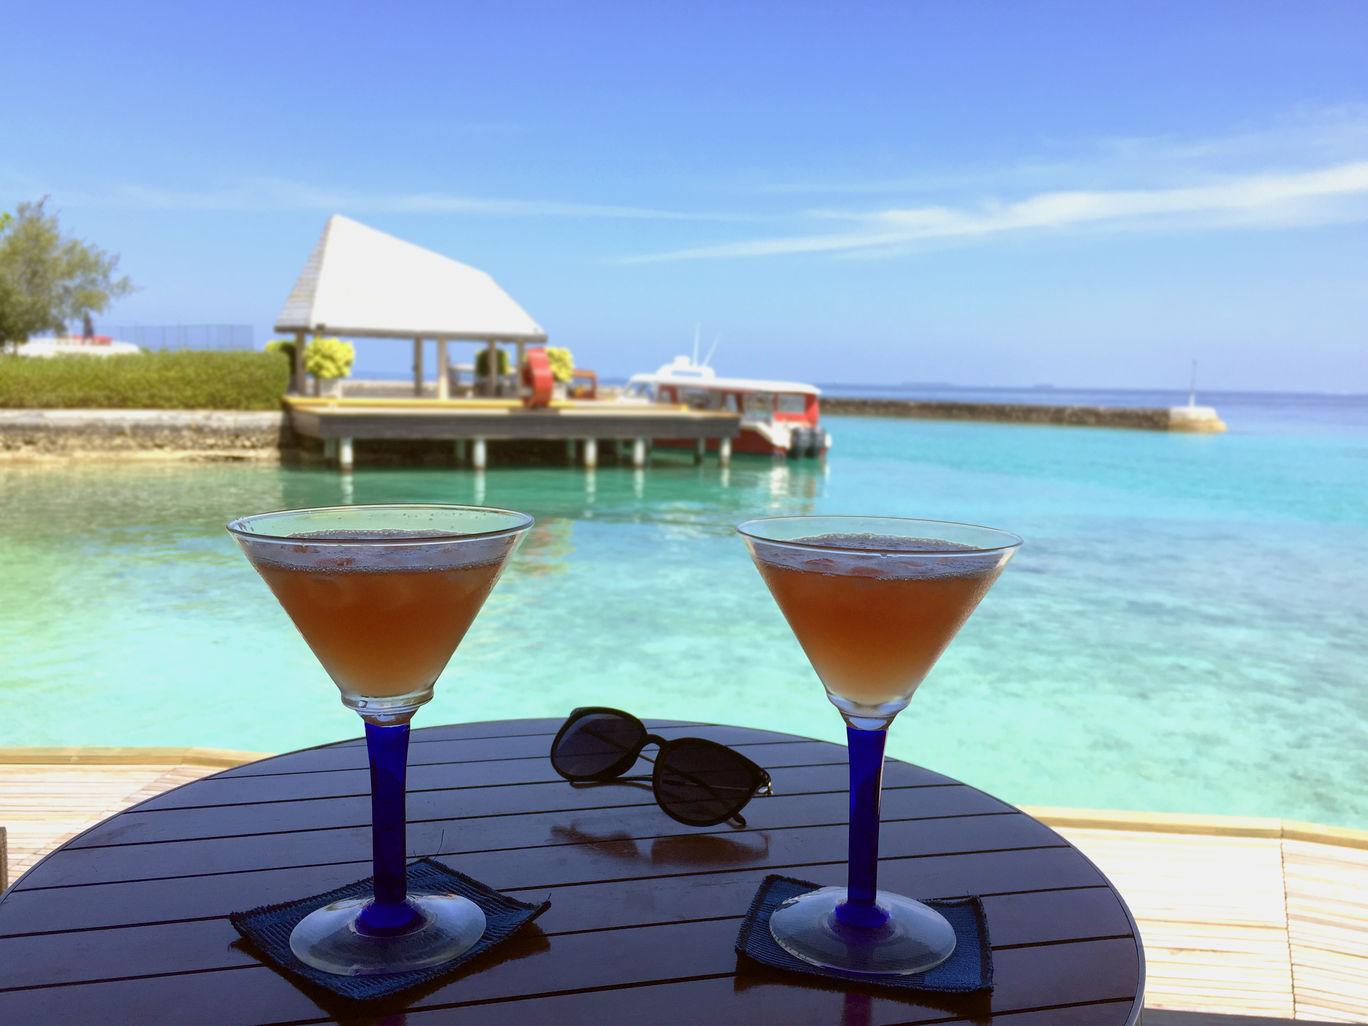 Photo of Maldives By Akshata S